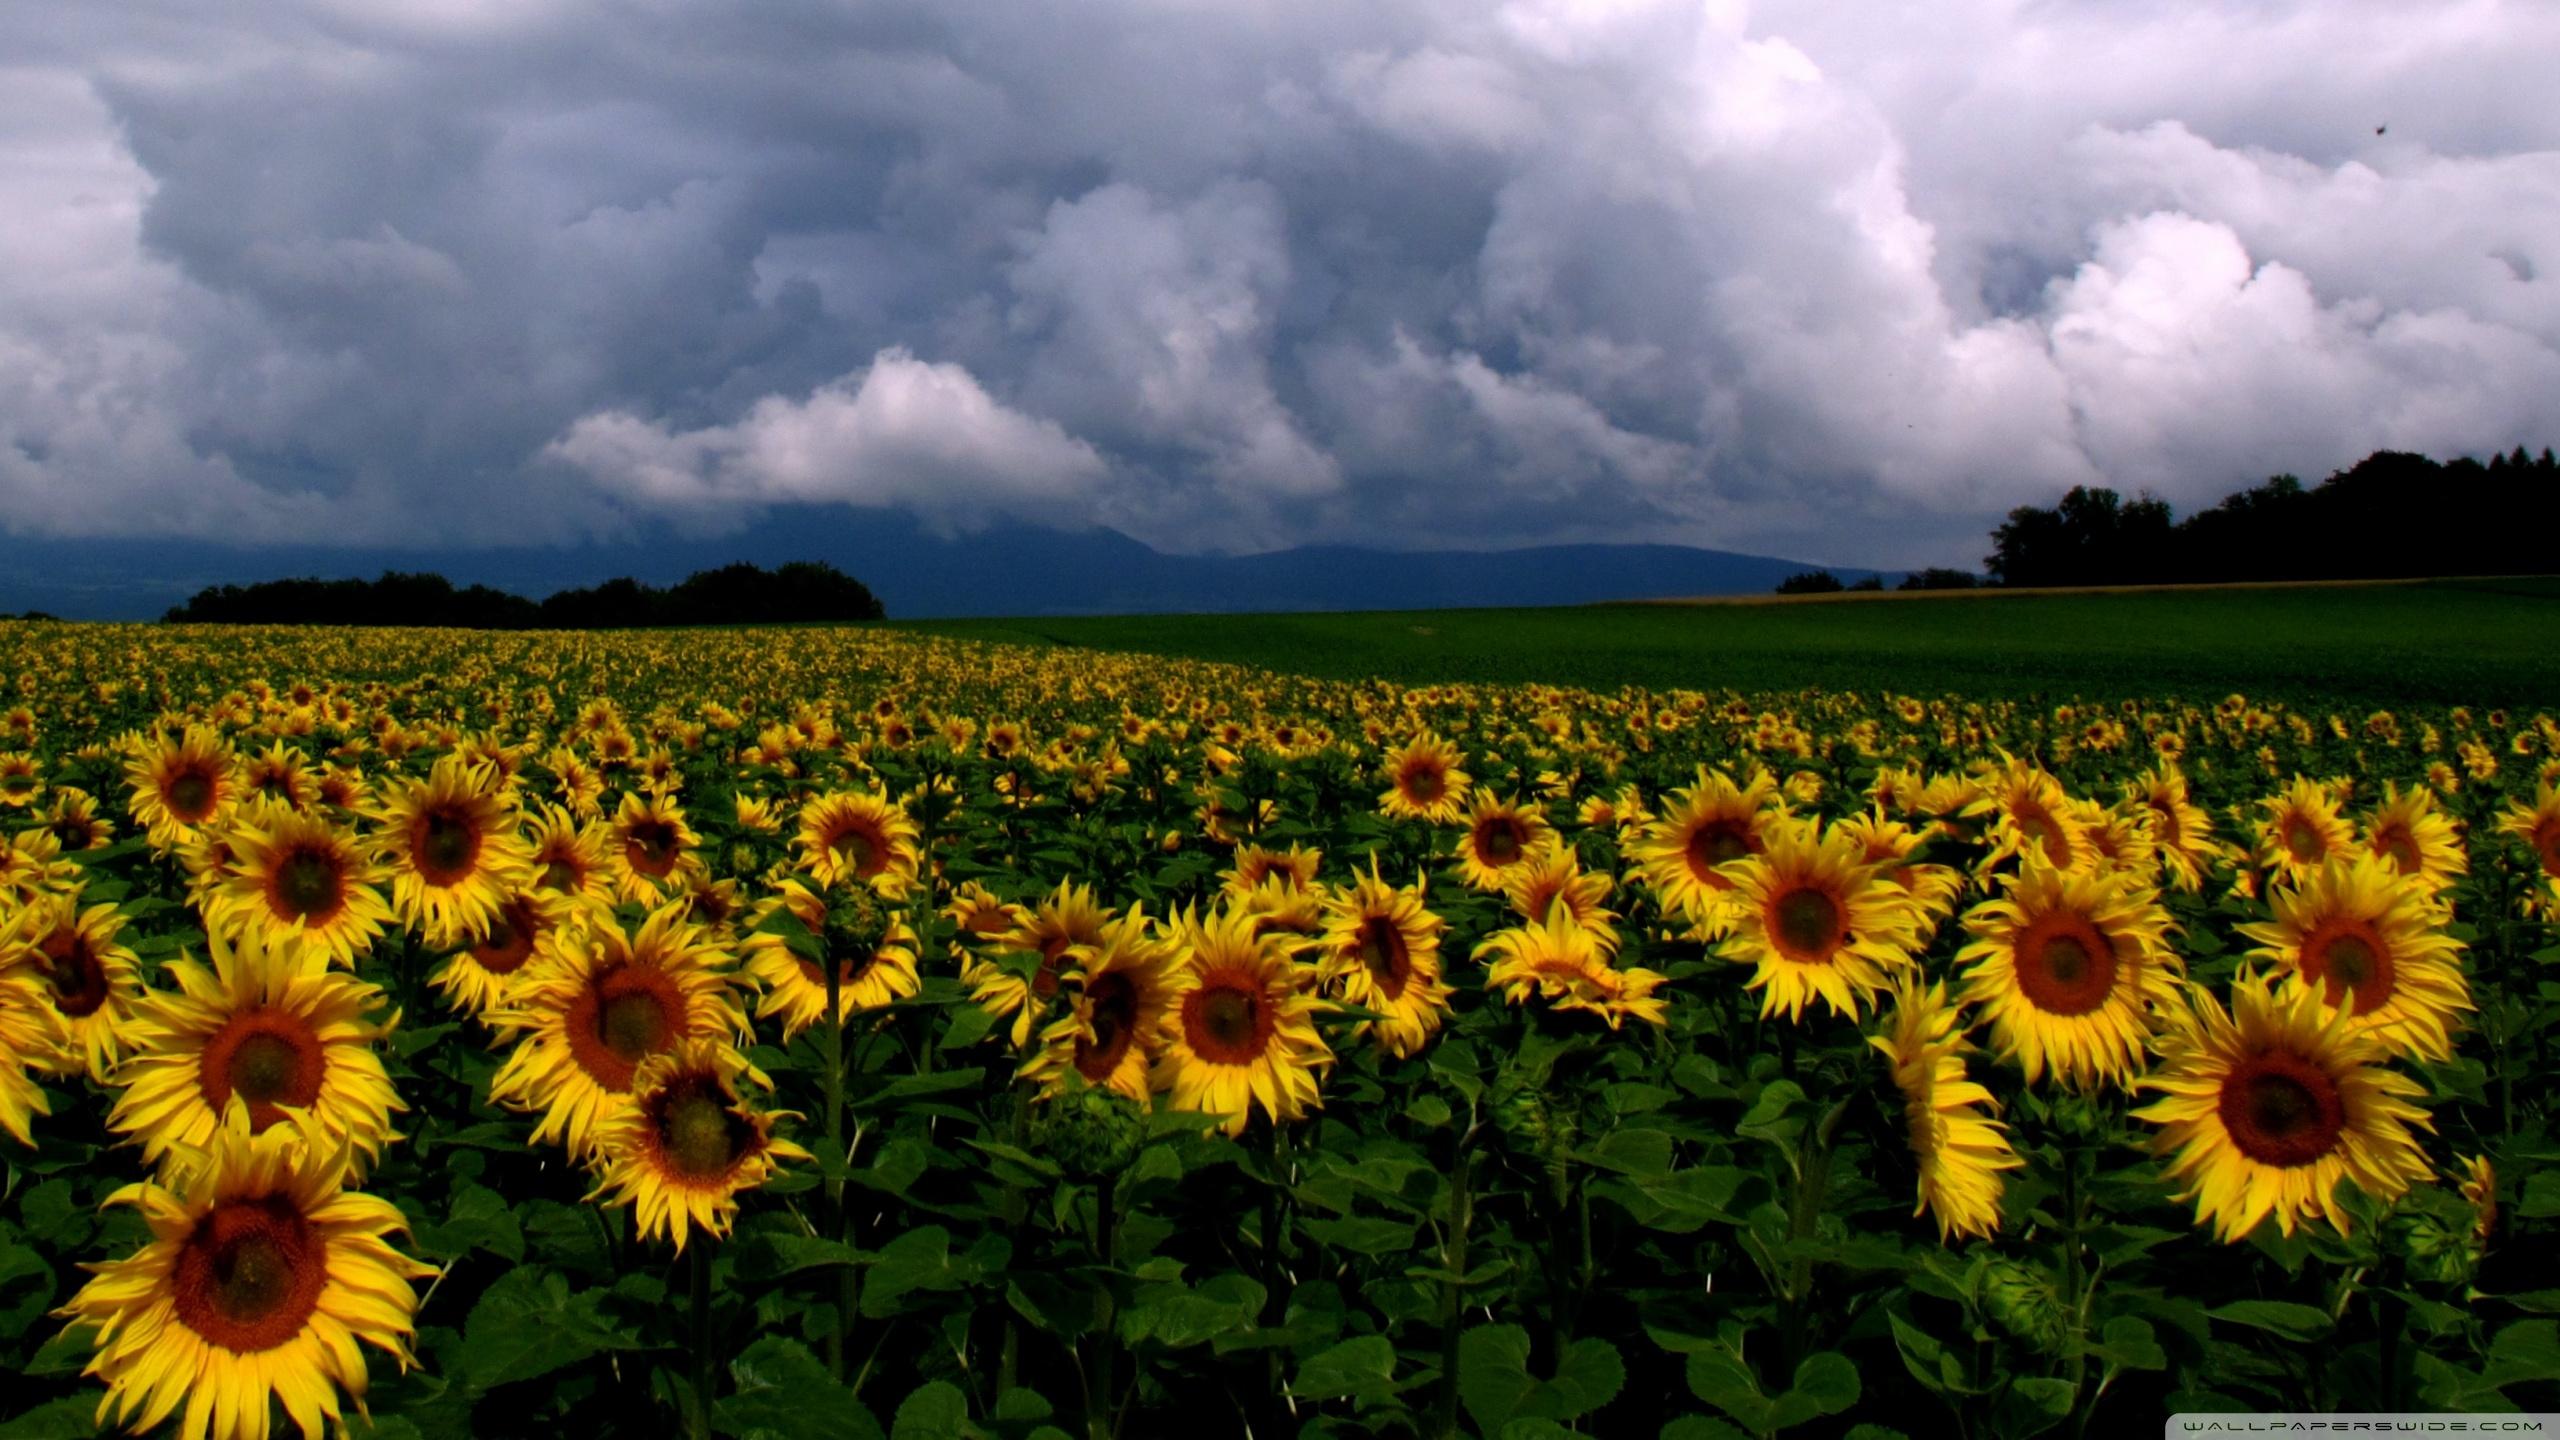 Sunflowers Field Ultra Hd Desktop Background Wallpaper For Multi Display Dual Monitor Tablet Smartphone